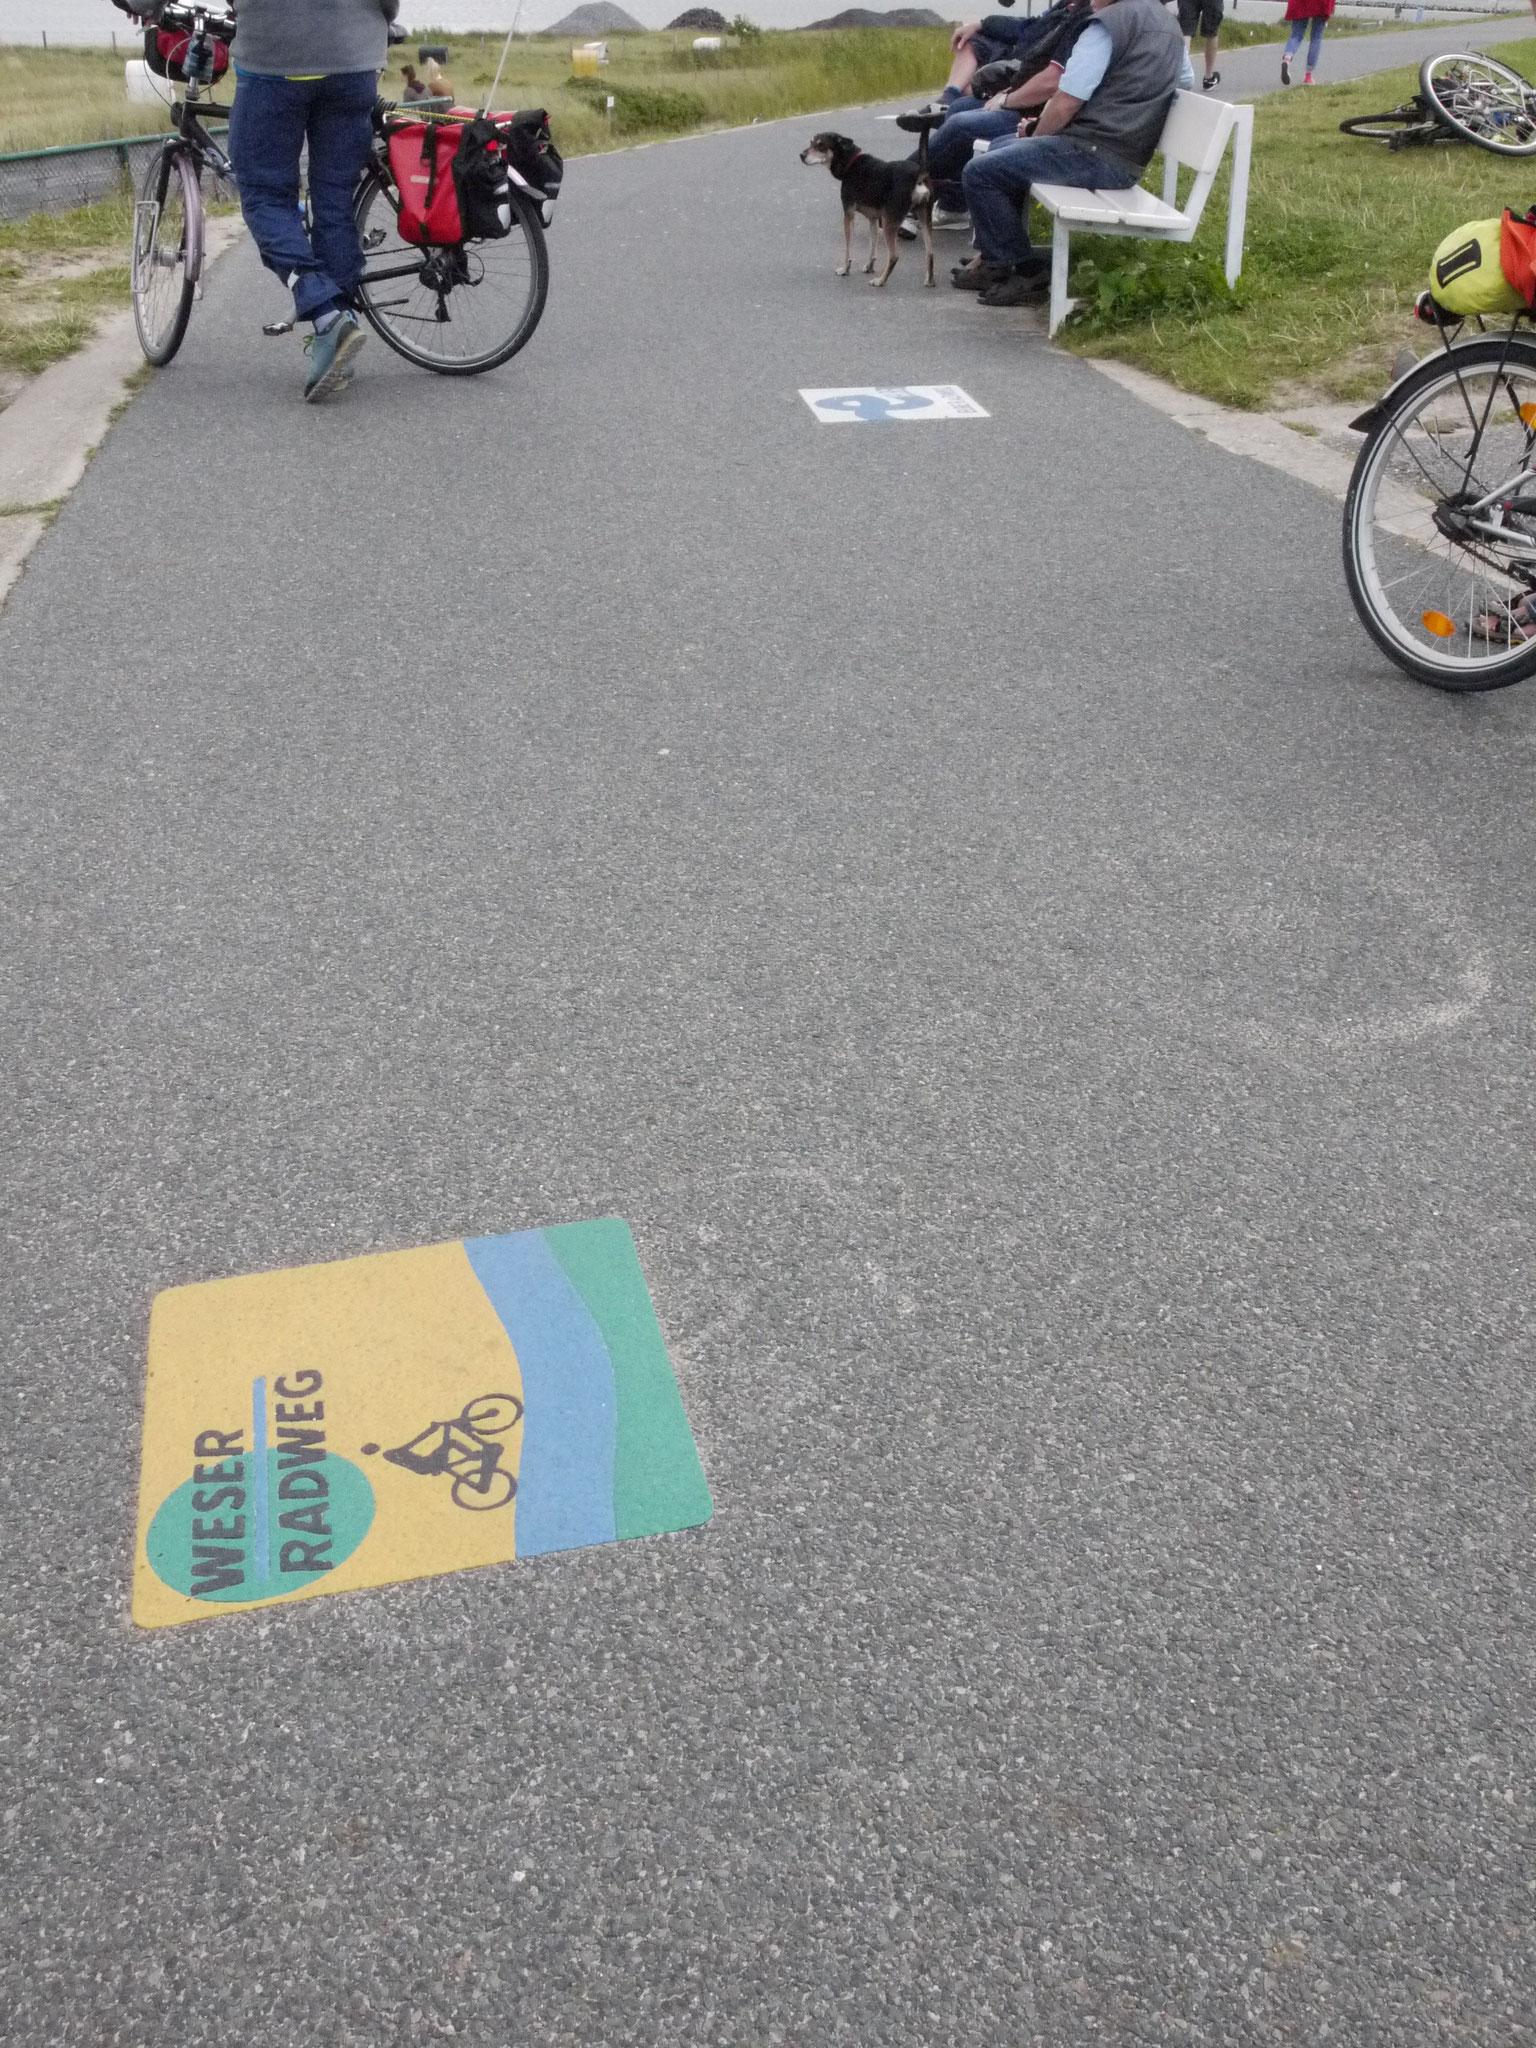 Weserradweg-Logo am Ende des Radweges, im Hintergrund der Elbradwegbeginn